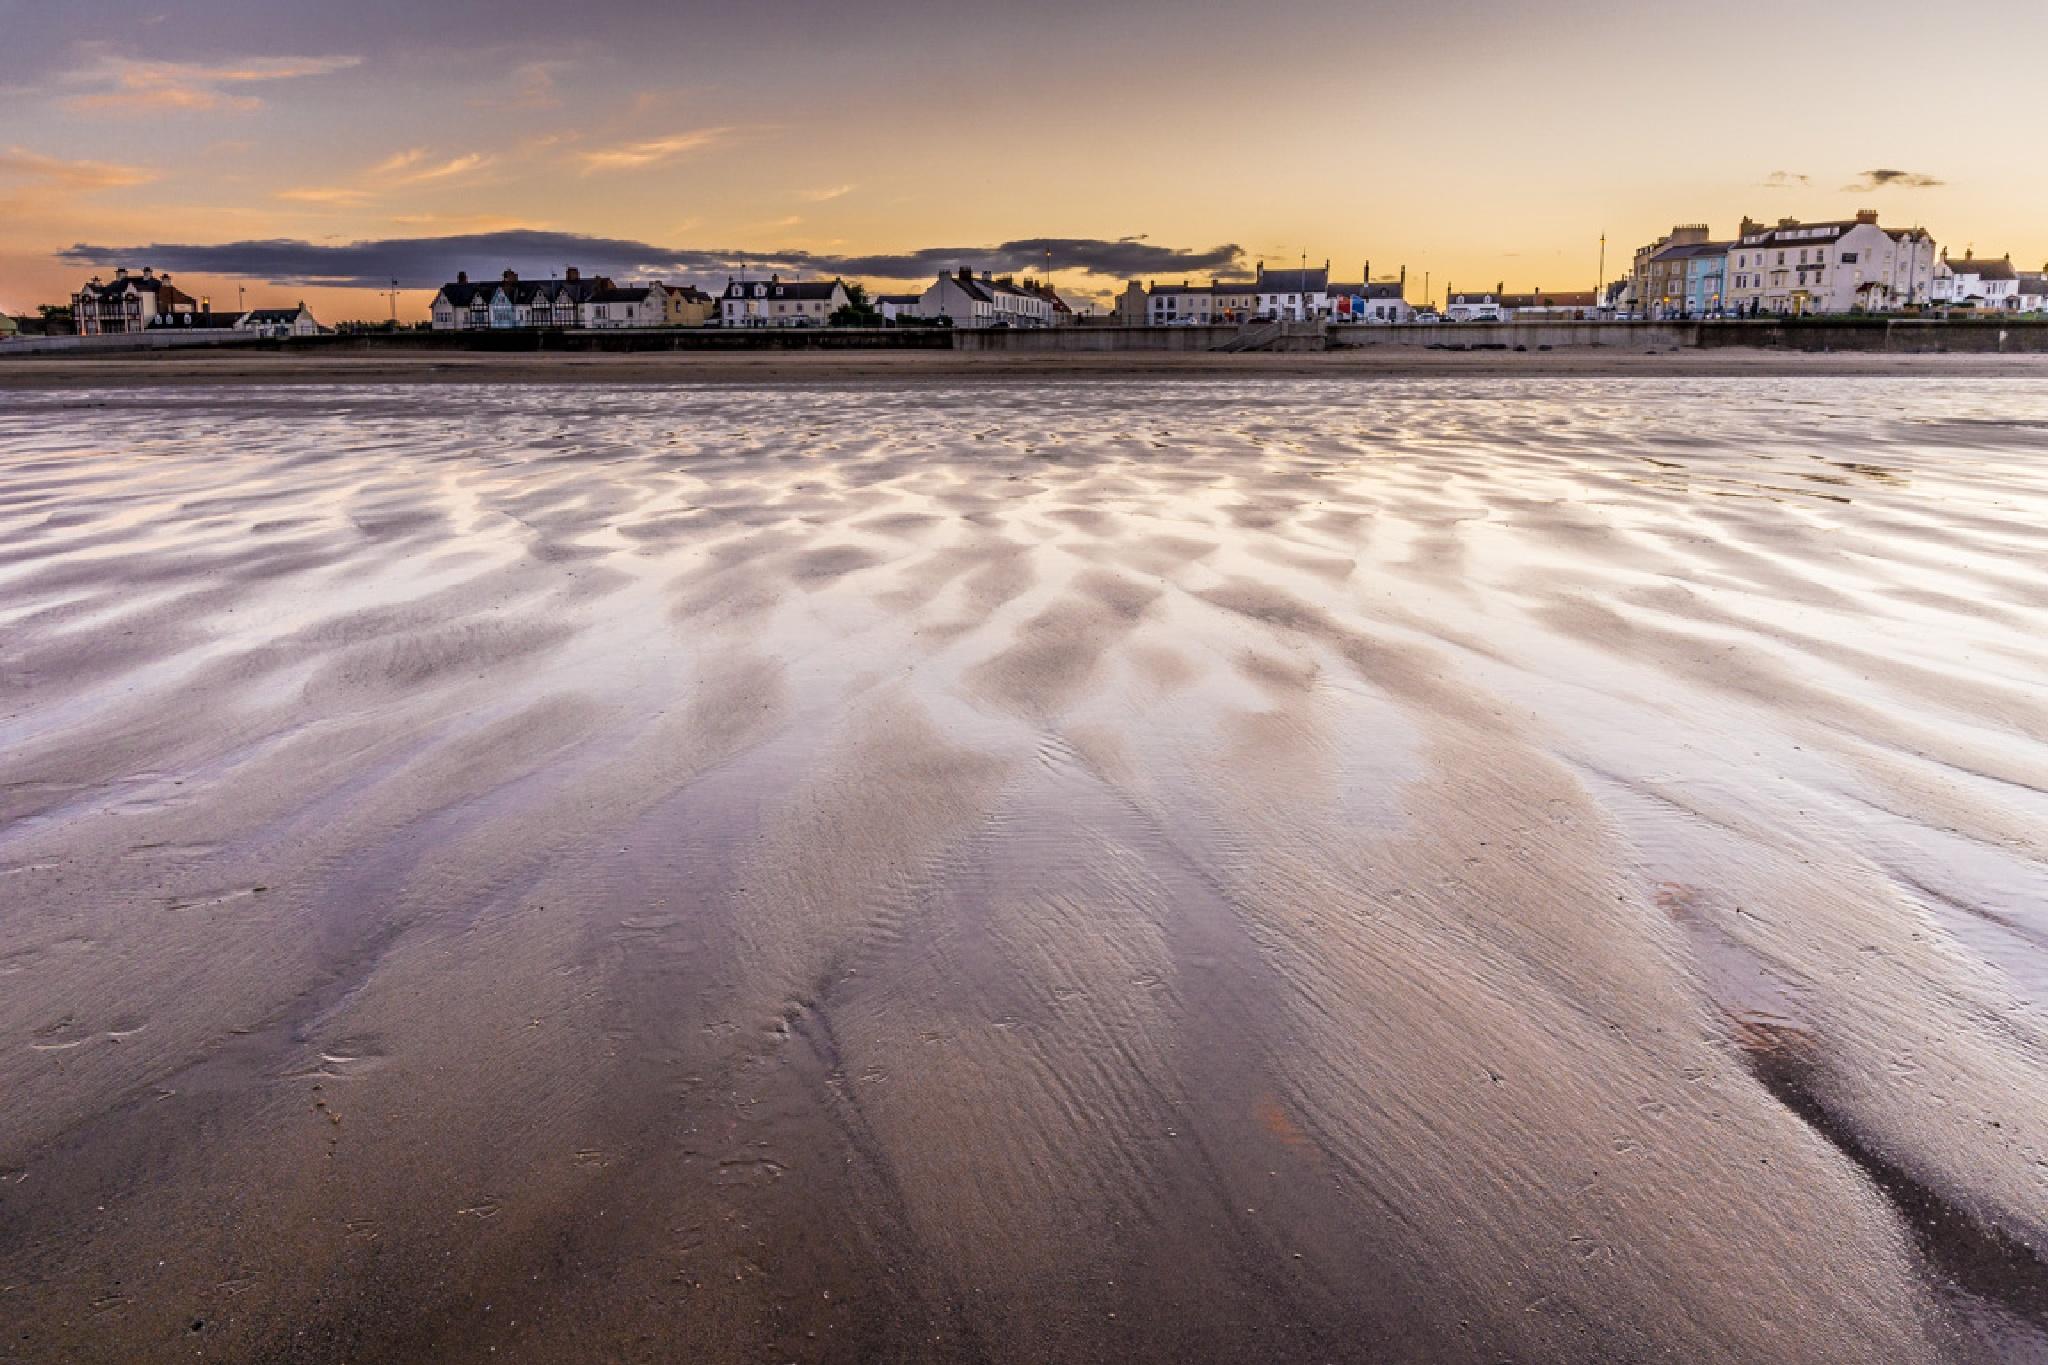 Seaton beach front at dusk. by NatureGirl